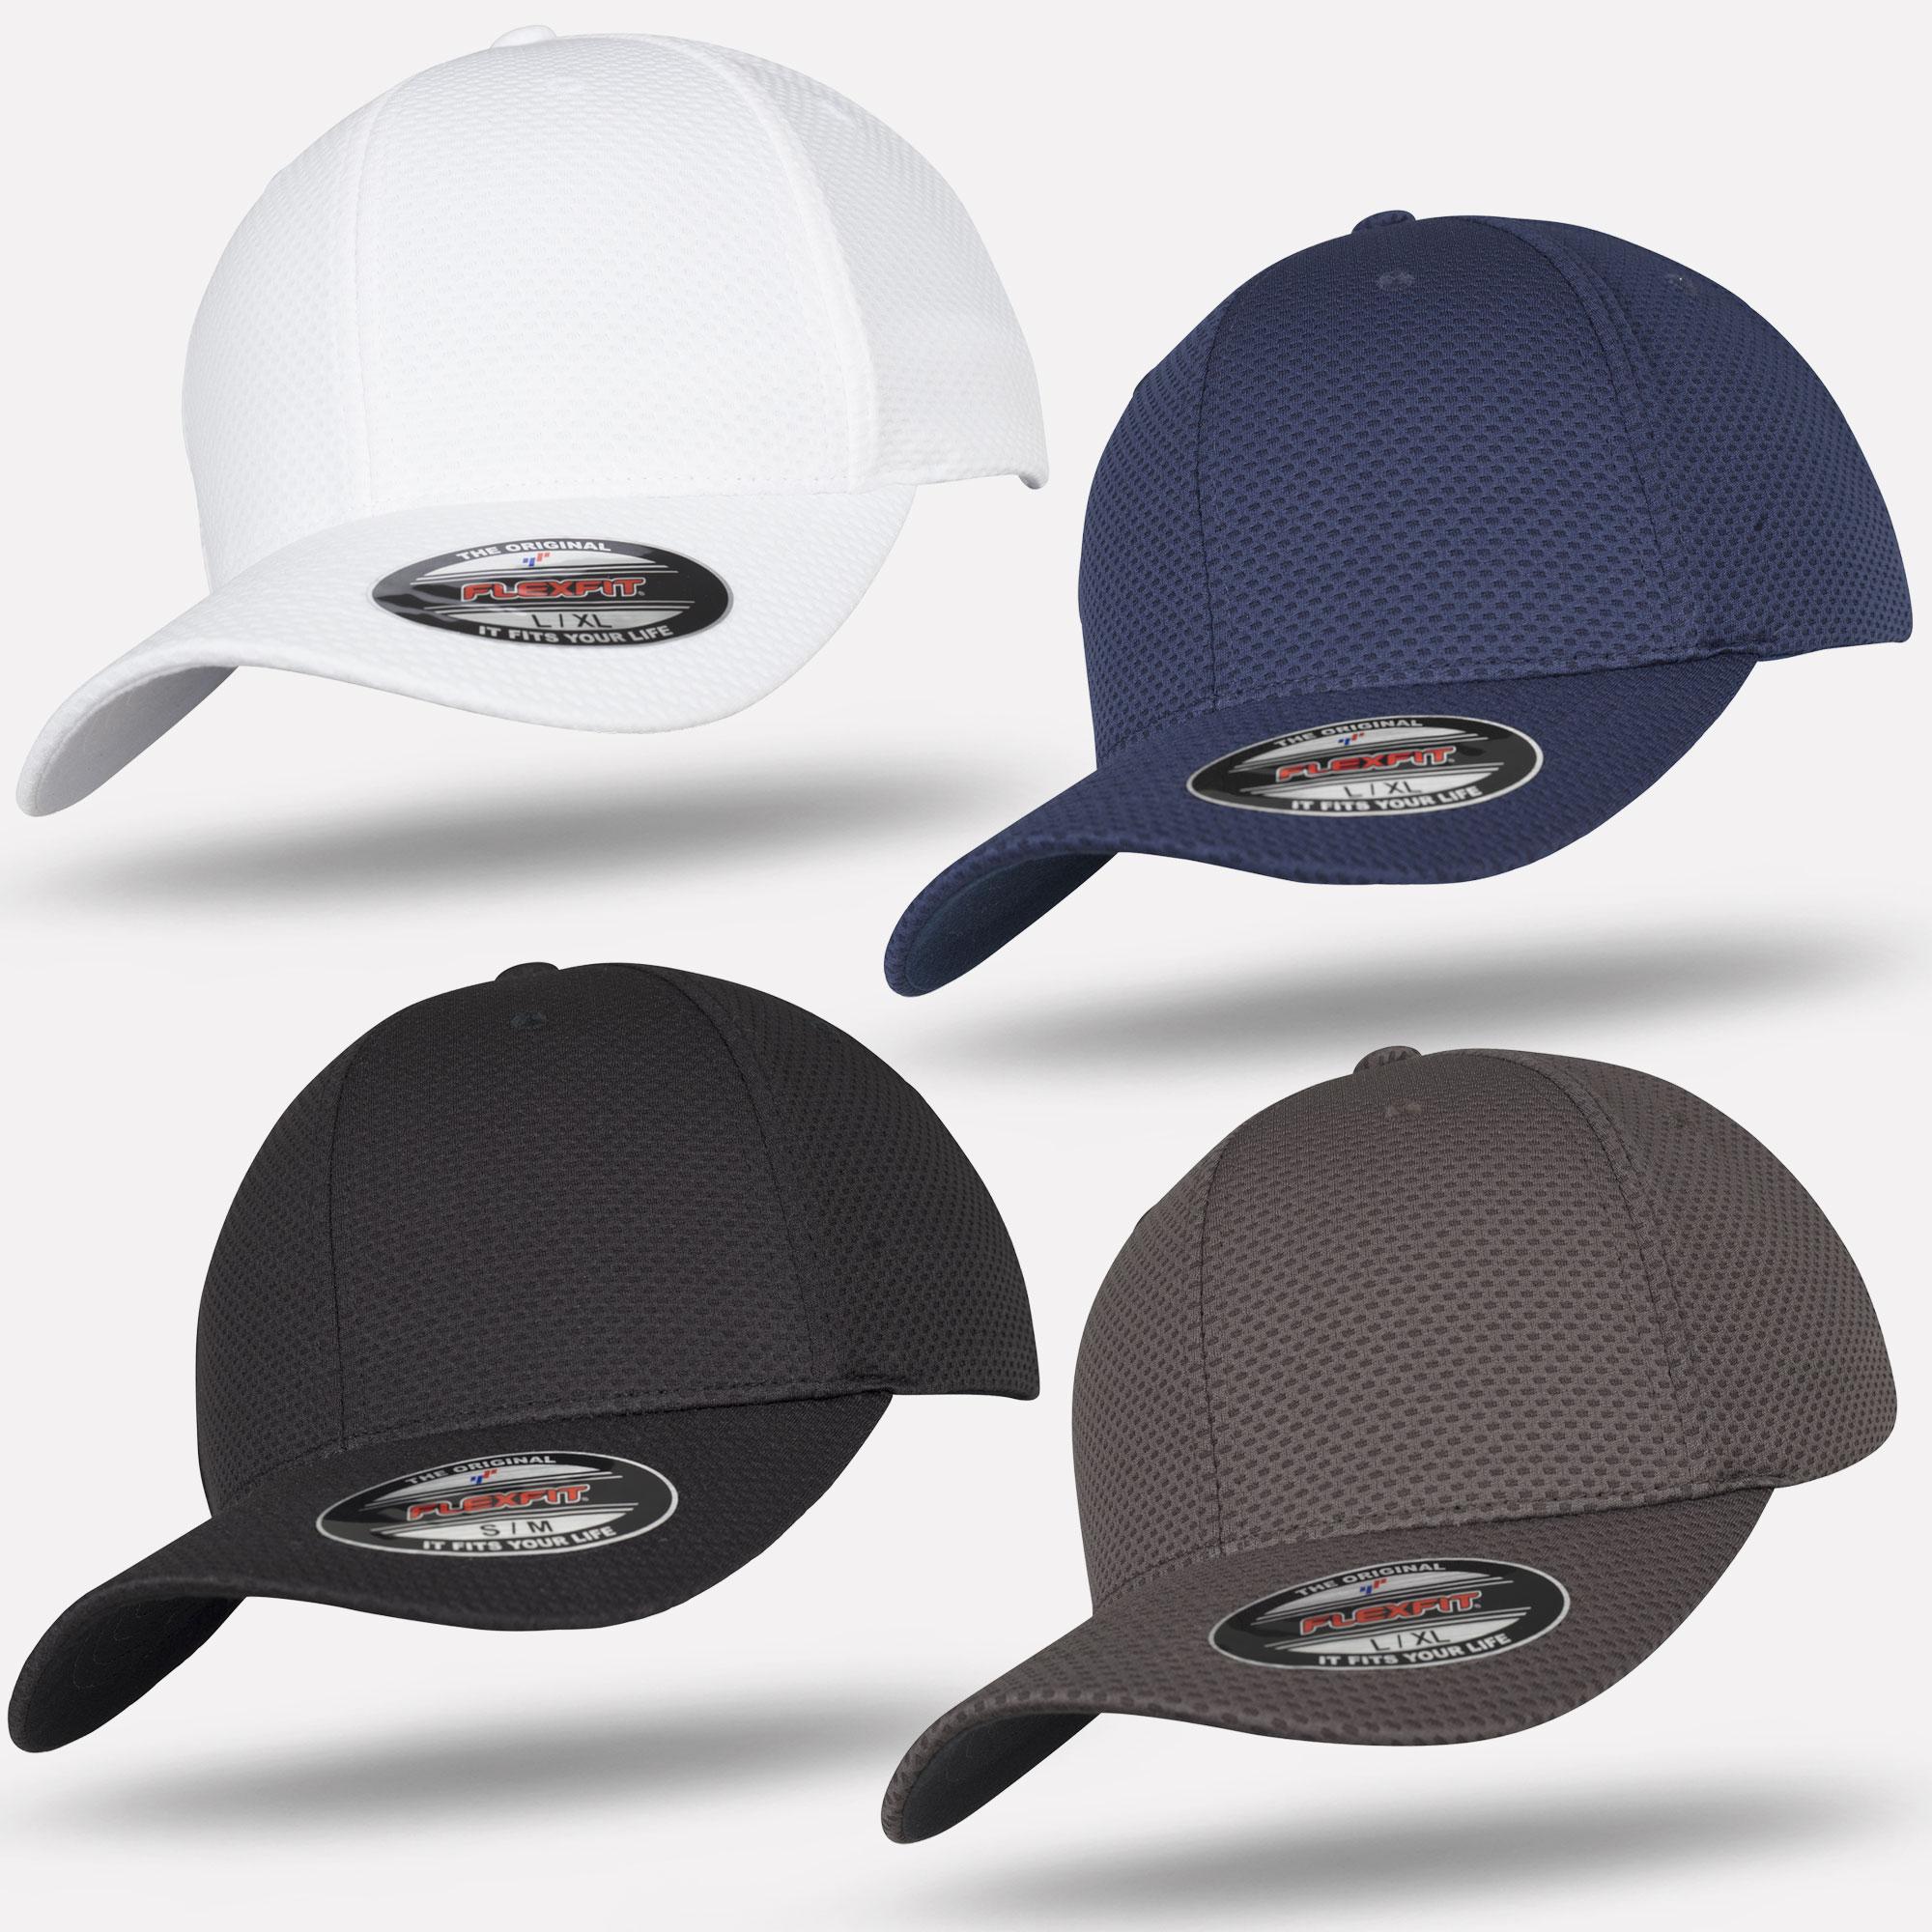 Flexfit ® ORIGINALE Basecap Baseball Cap Berretto Mesh Trucker VISIERA